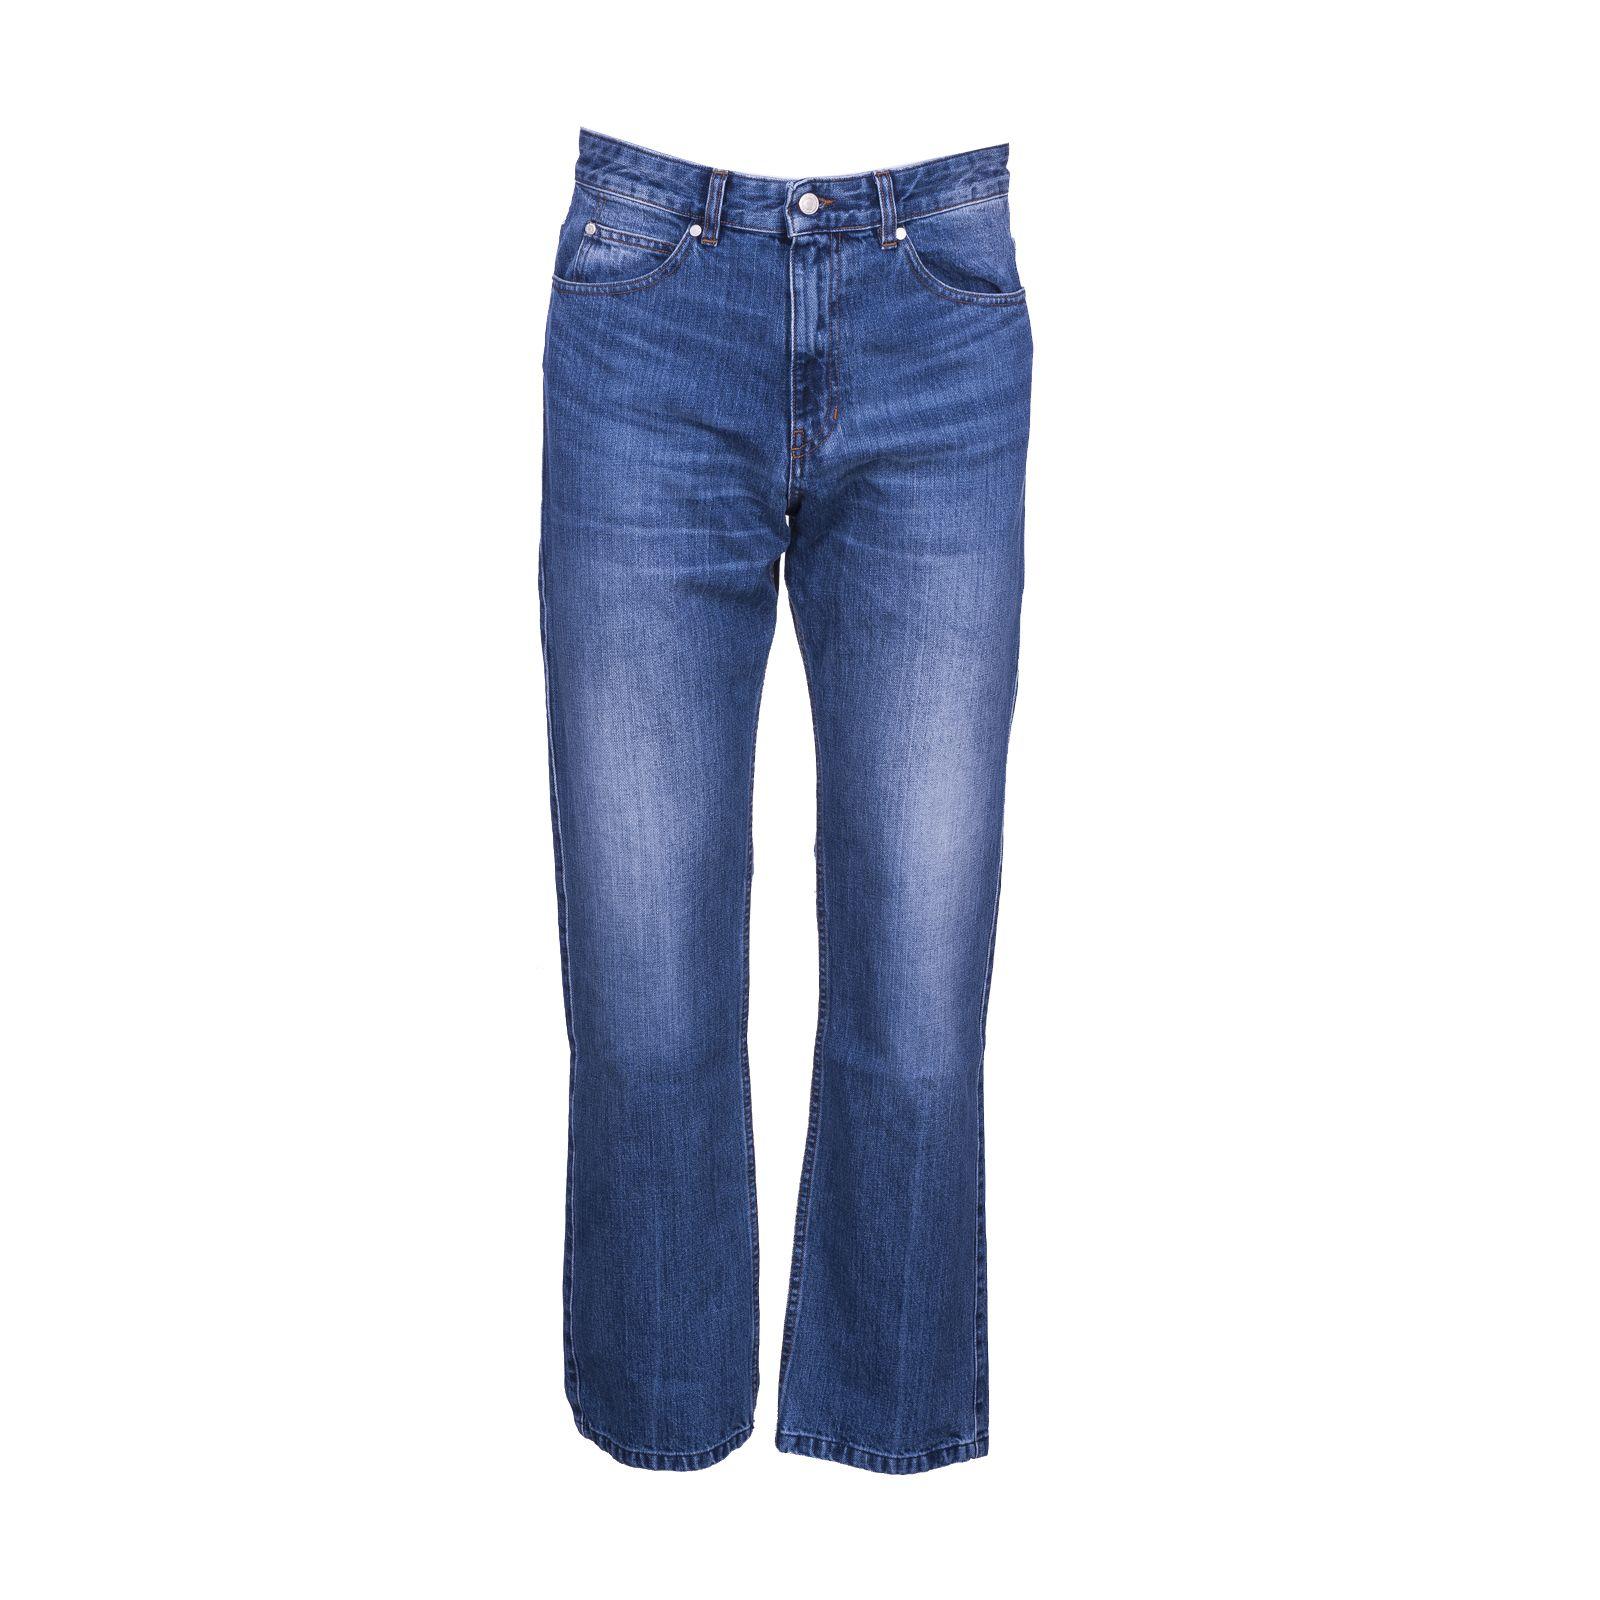 Ami Five Pockets Jeans